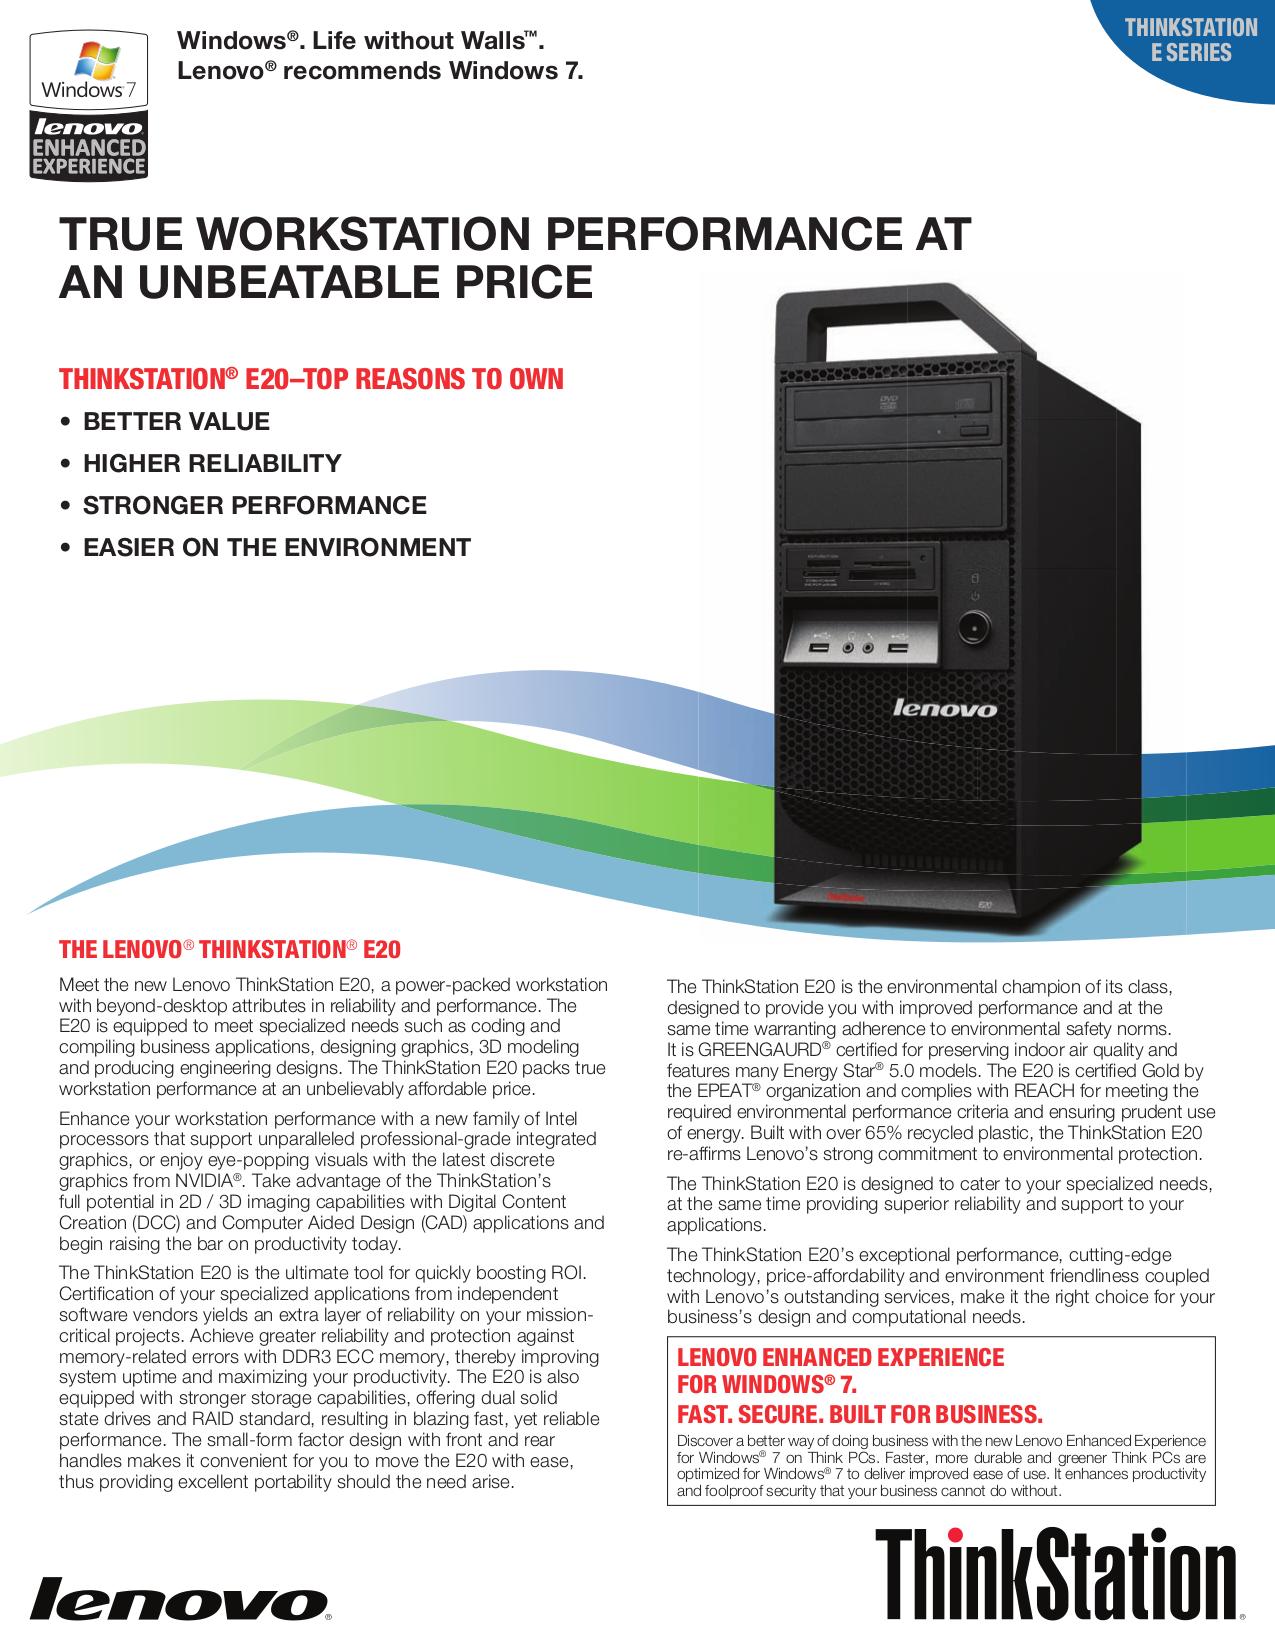 pdf for Lenovo Desktop ThinkStation E20 4221 manual